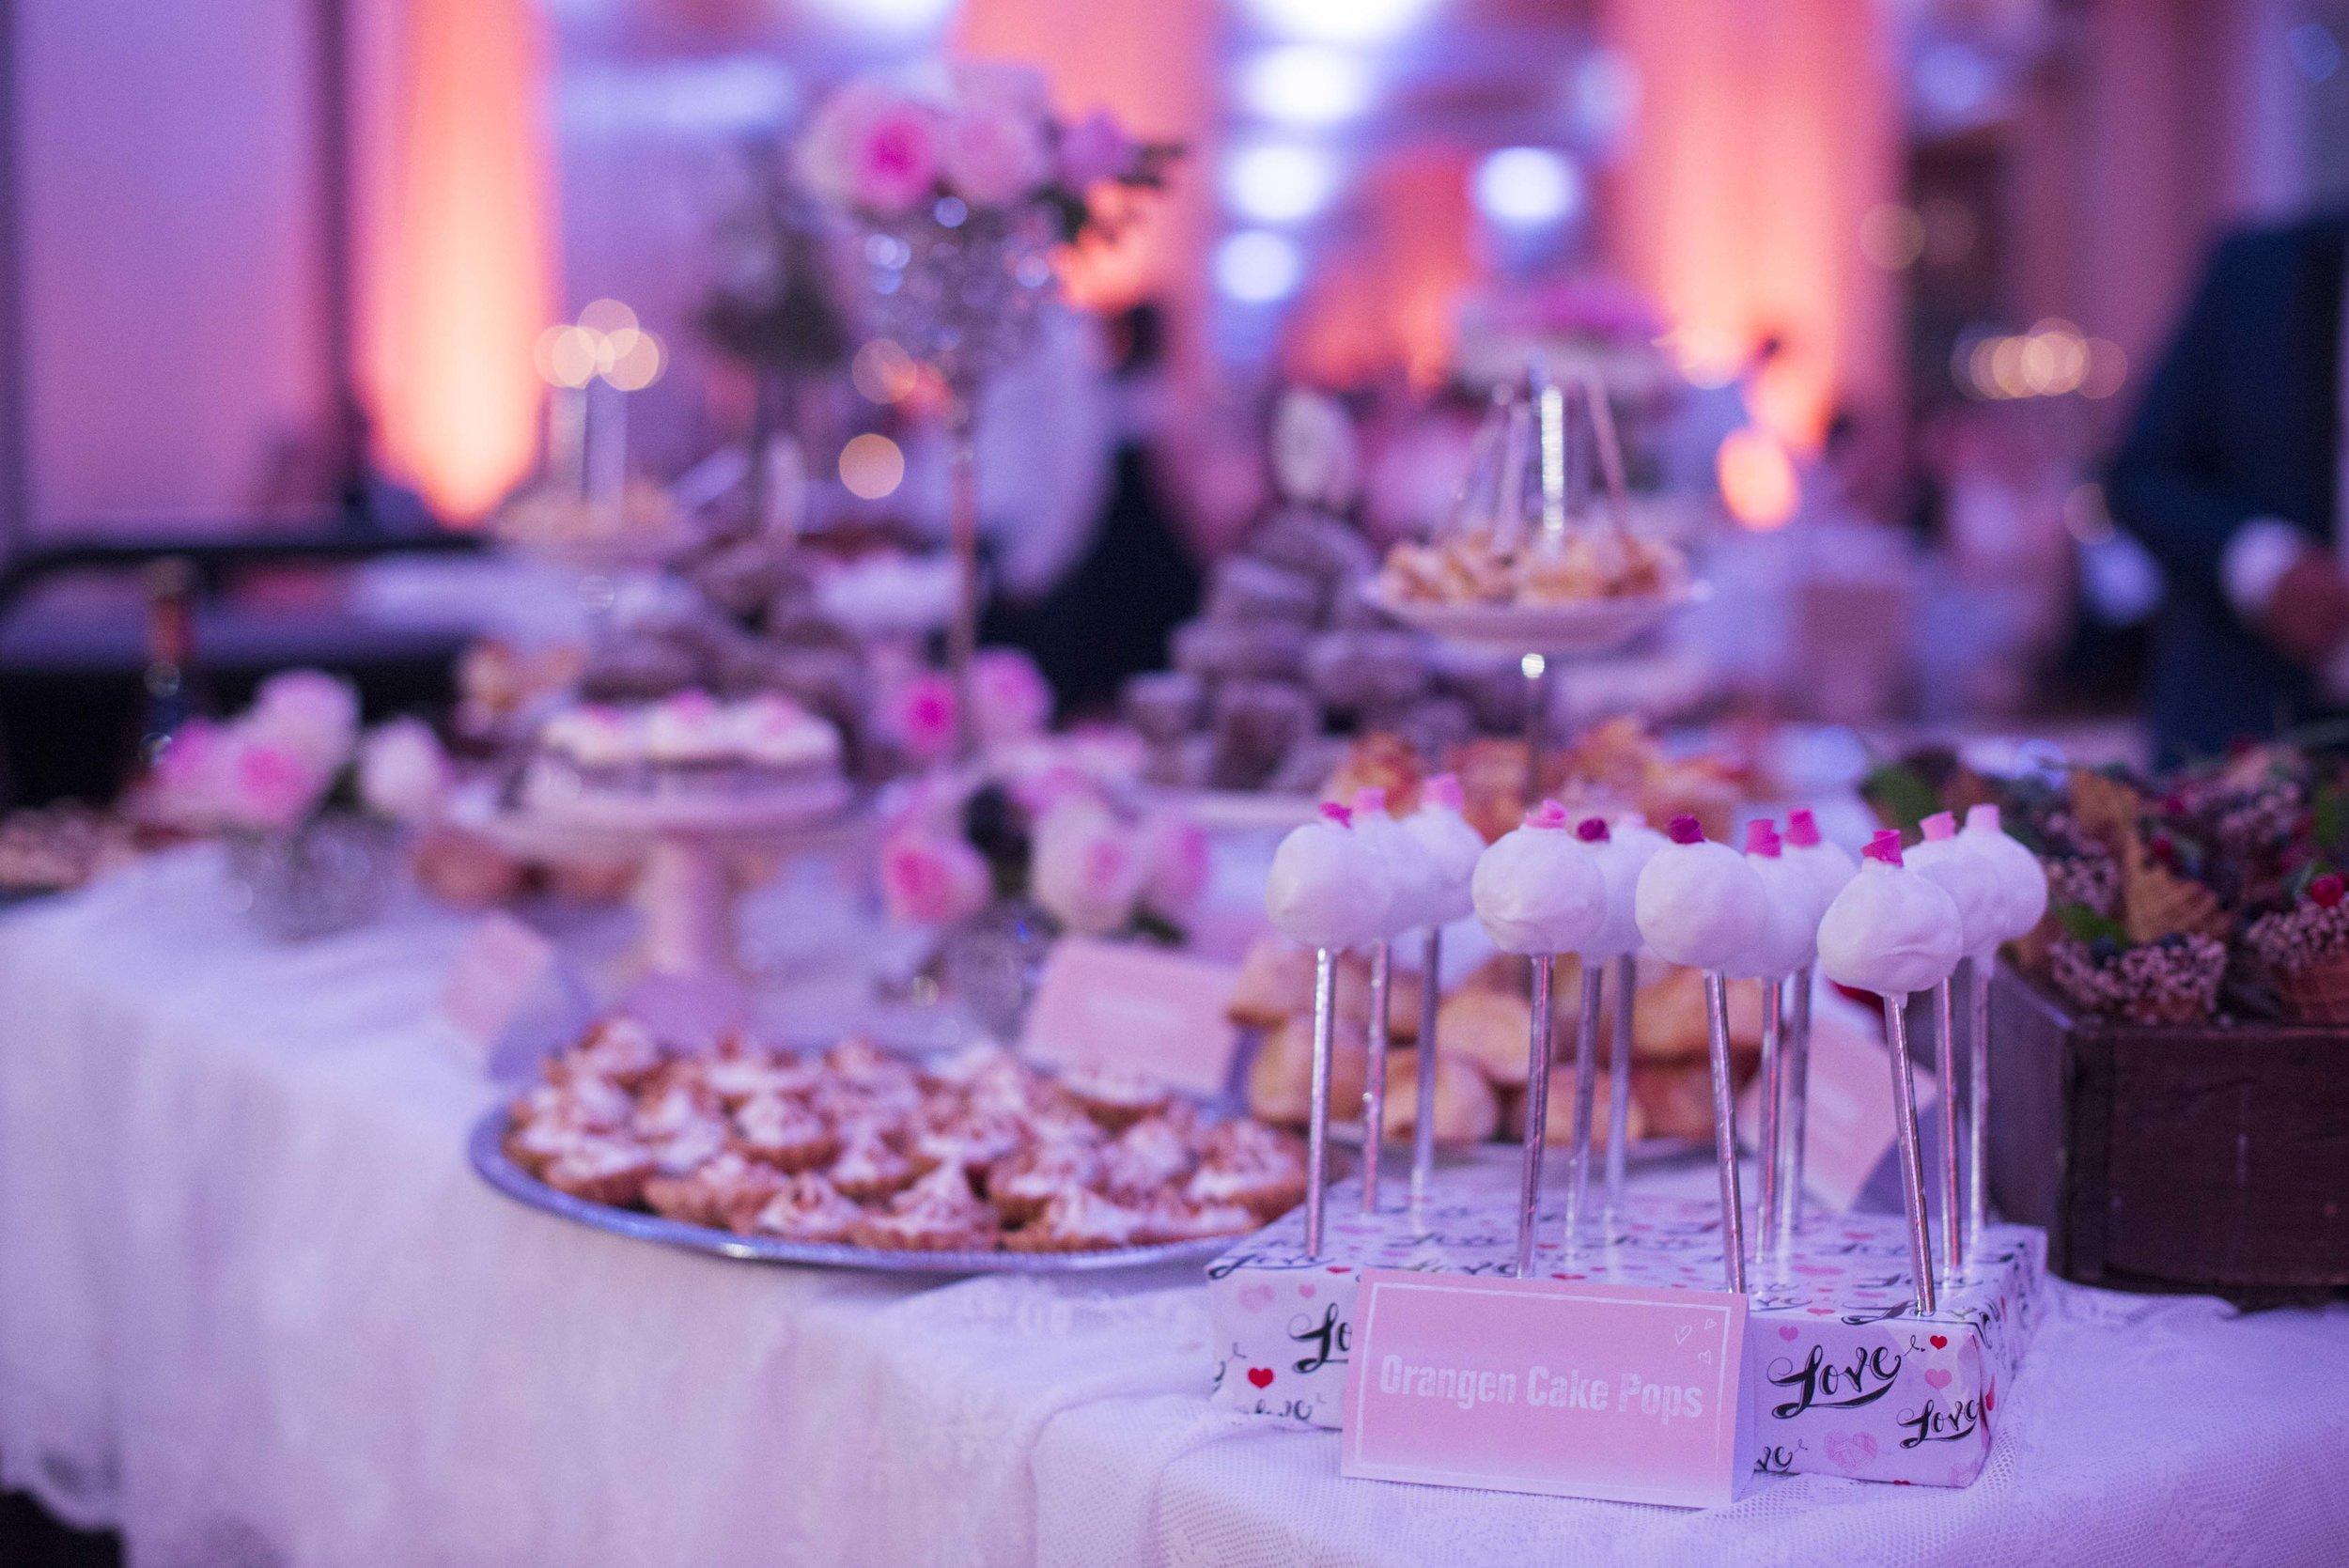 Röschen Cake Pops.jpg